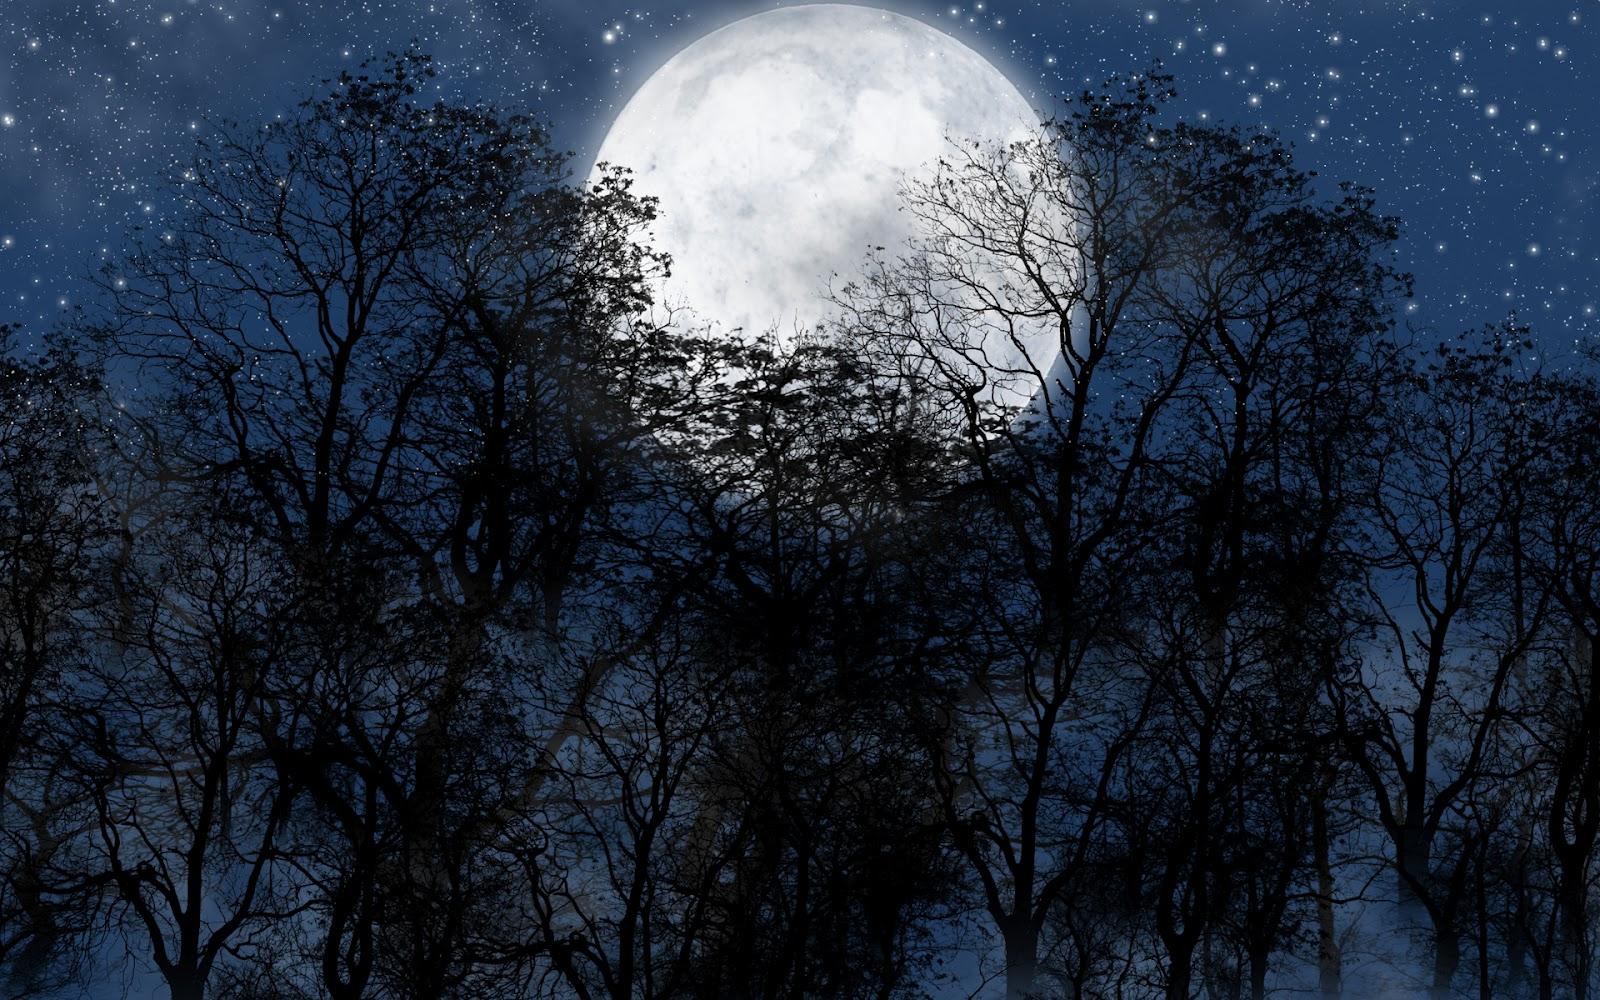 http://1.bp.blogspot.com/-udyzNZoh1_0/T9DGN7ePrpI/AAAAAAAAe0Q/HilPQSE0trk/s1600/Luna-llena-y-Estrellas_Imagenes-de-Fondo-HD.jpg